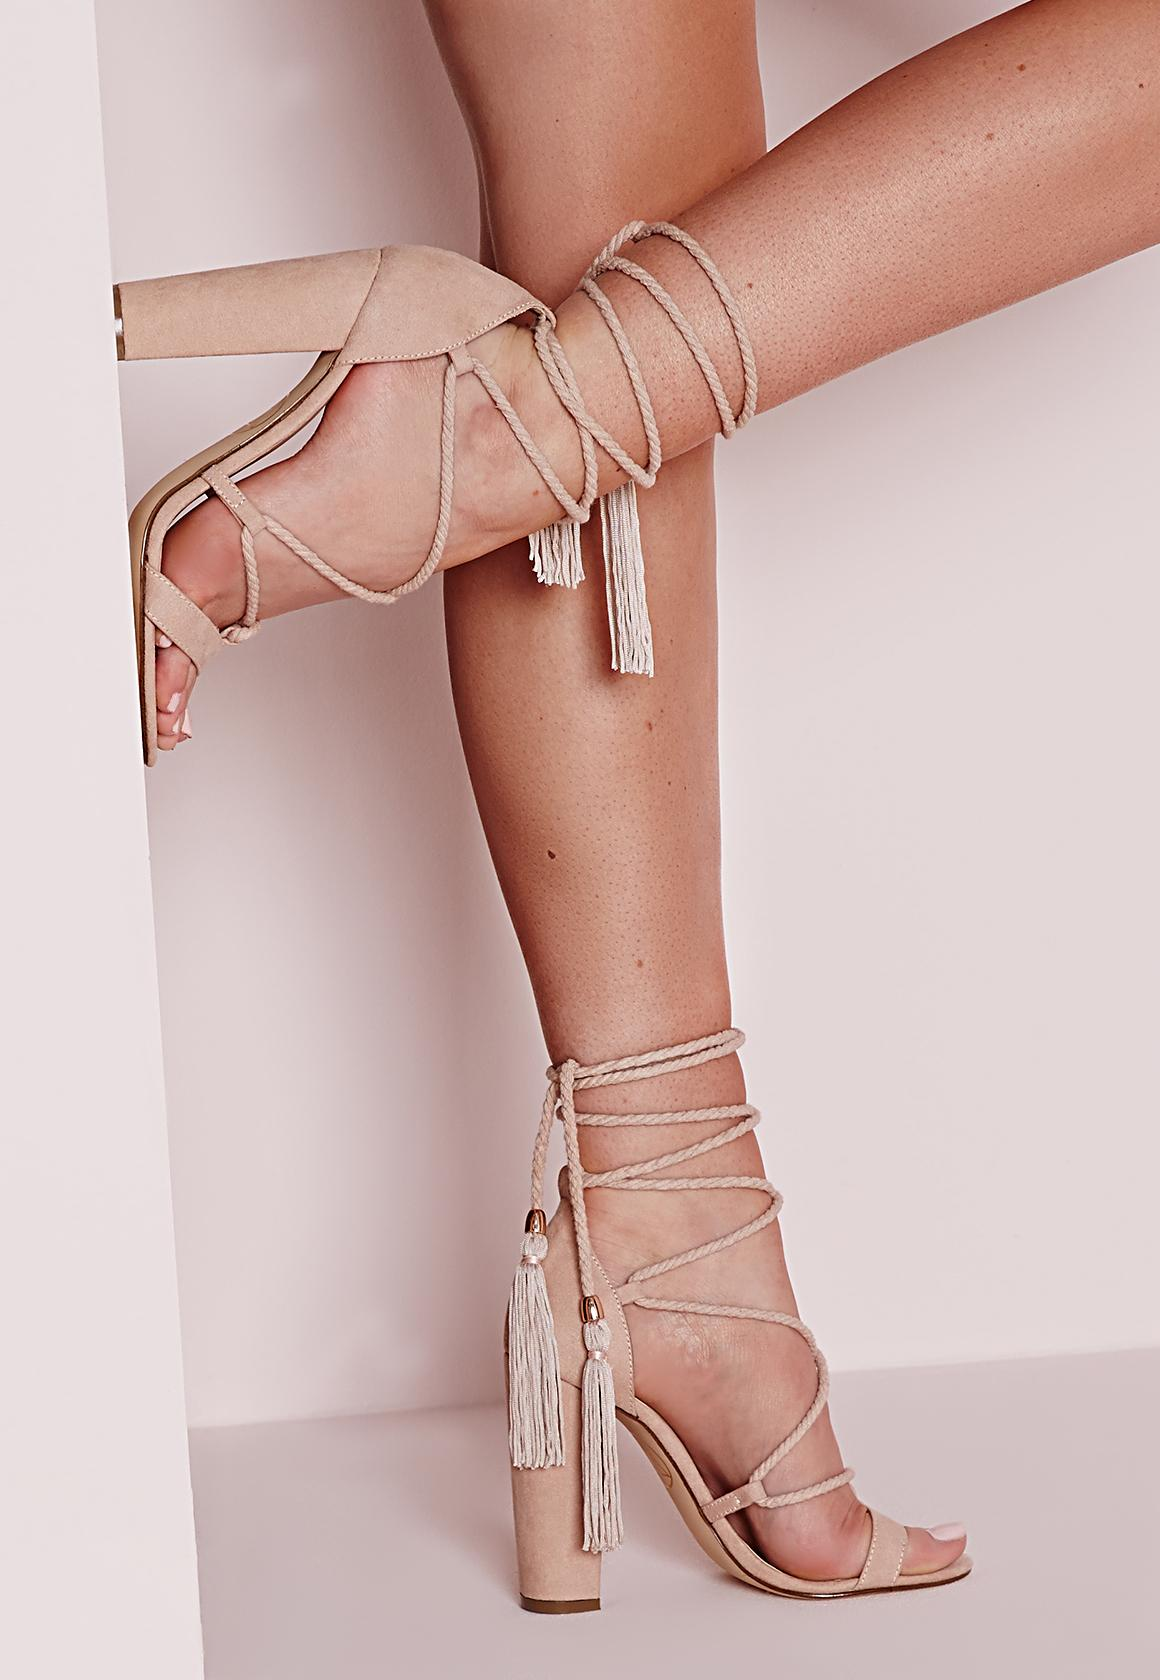 Lace Up Tassel Block Heel Sandals Nude - Shoes - High Heels ...